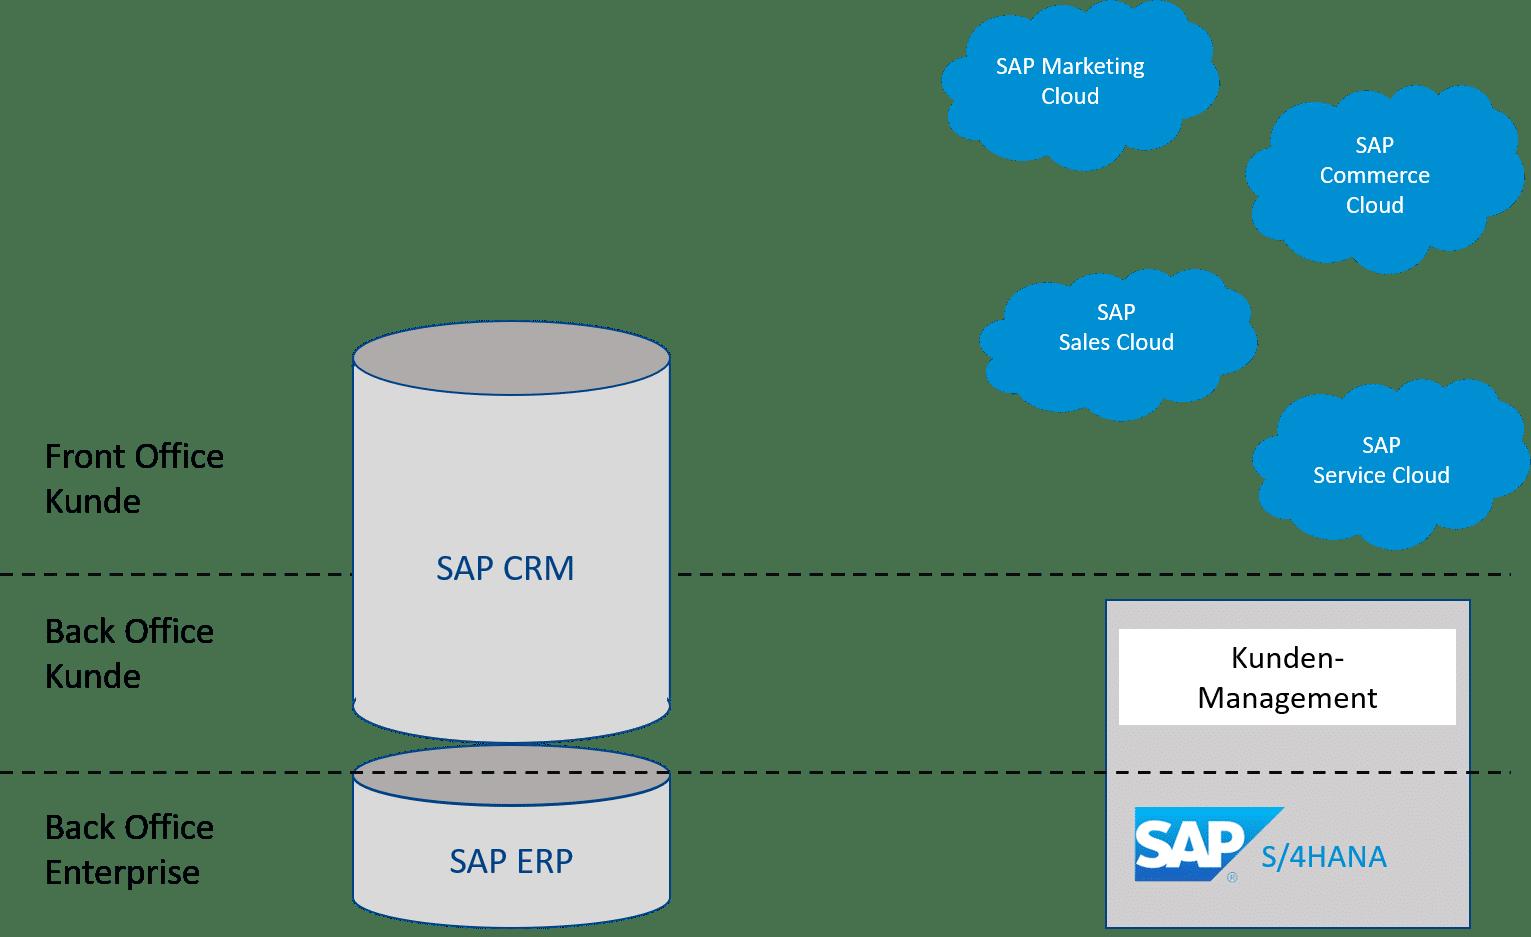 SAP S/4HANA Cloud CRM